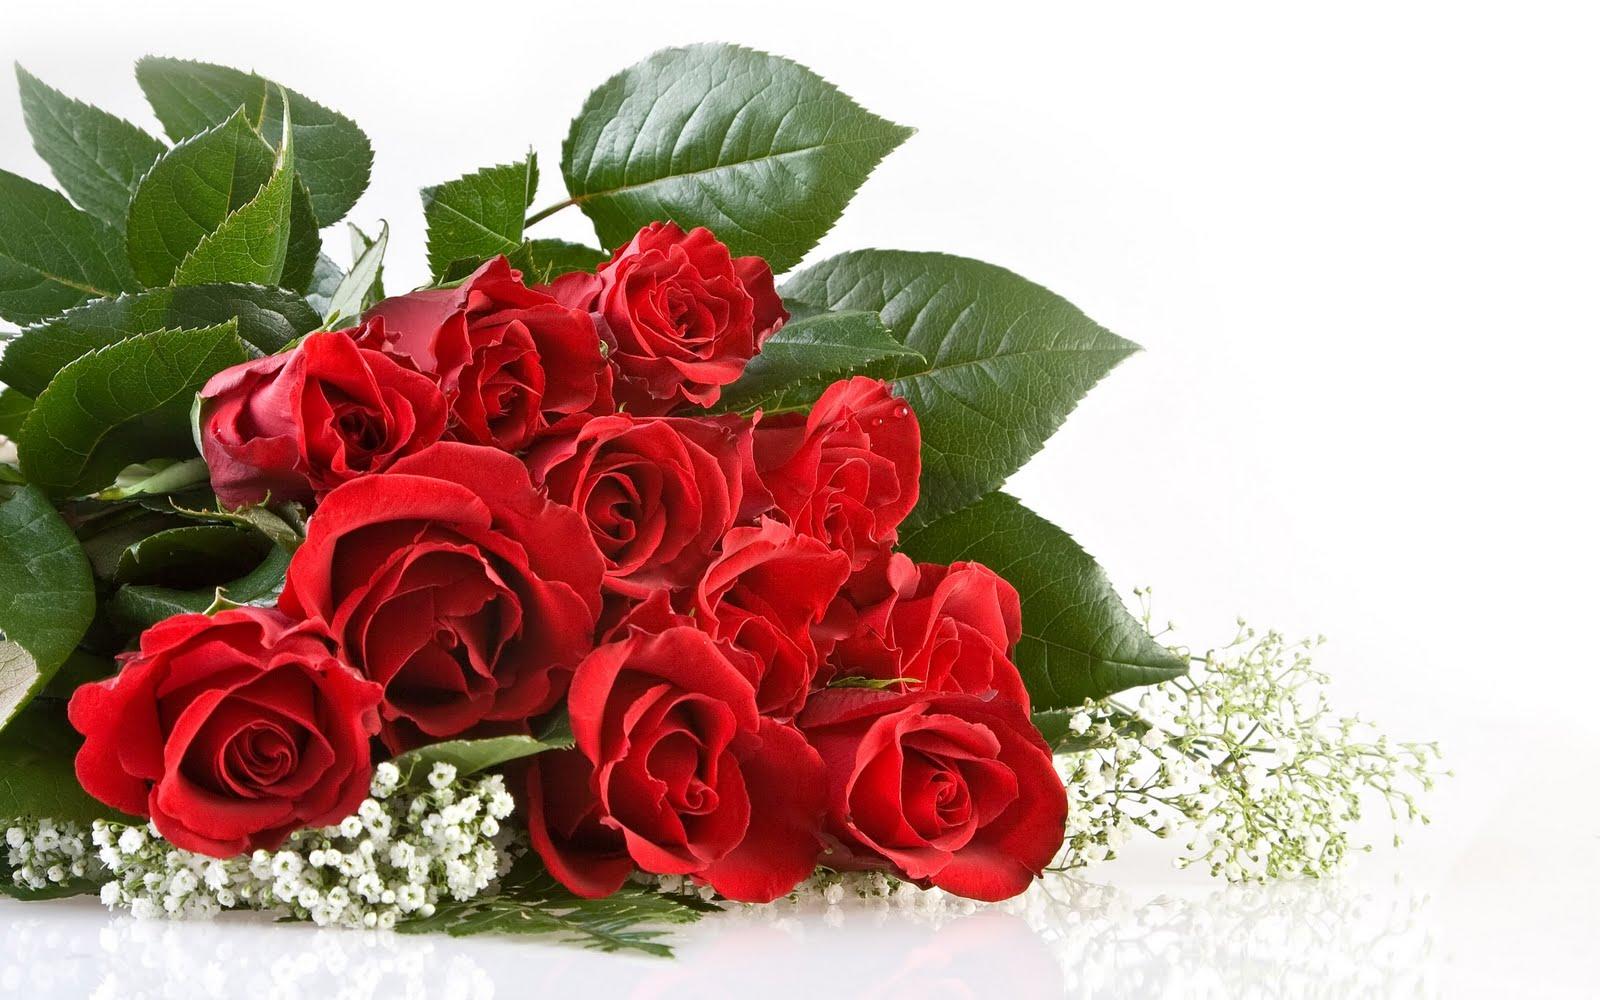 buchet_trandafiri_rosi.JPG